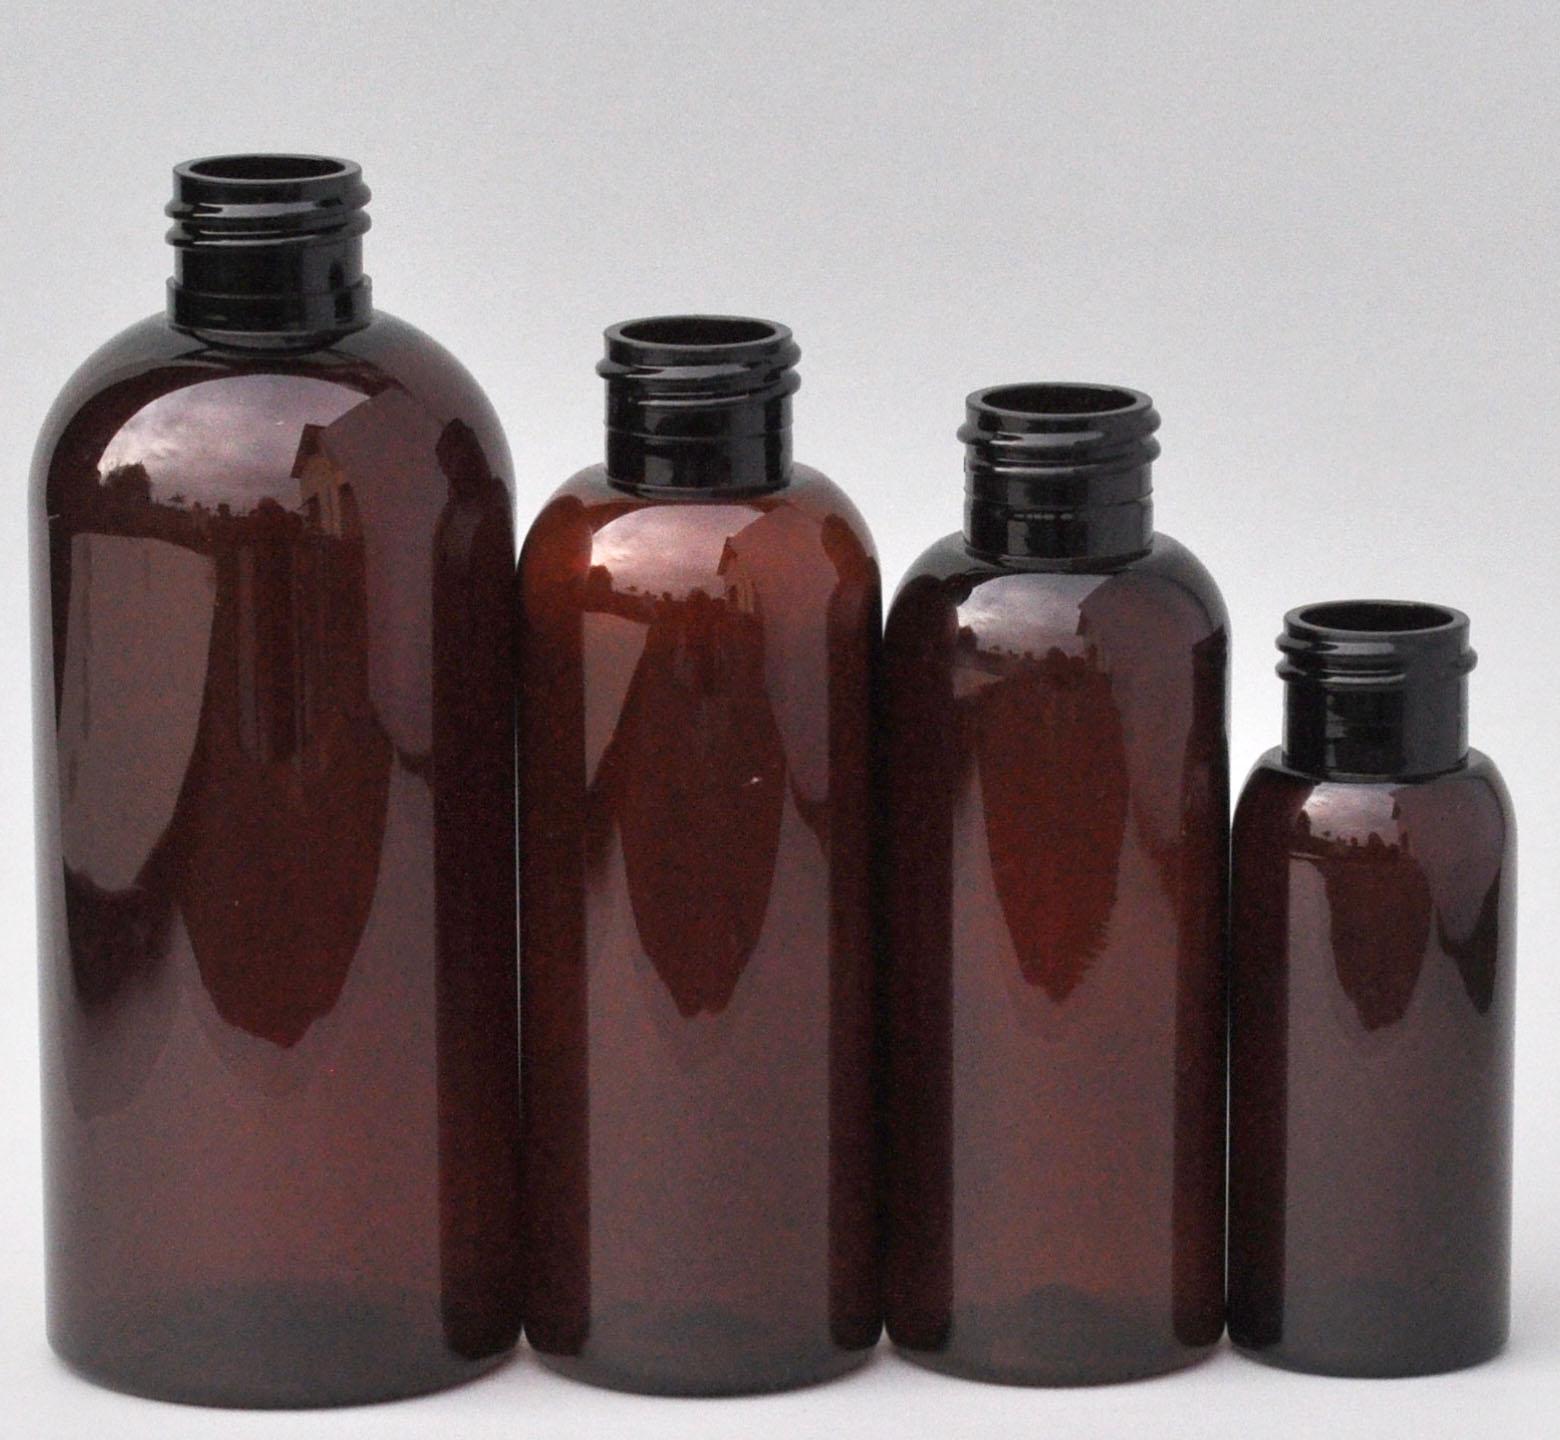 SNEP-100BPETA-100ml Amber PET Boston Bottle with 24/410 Neck